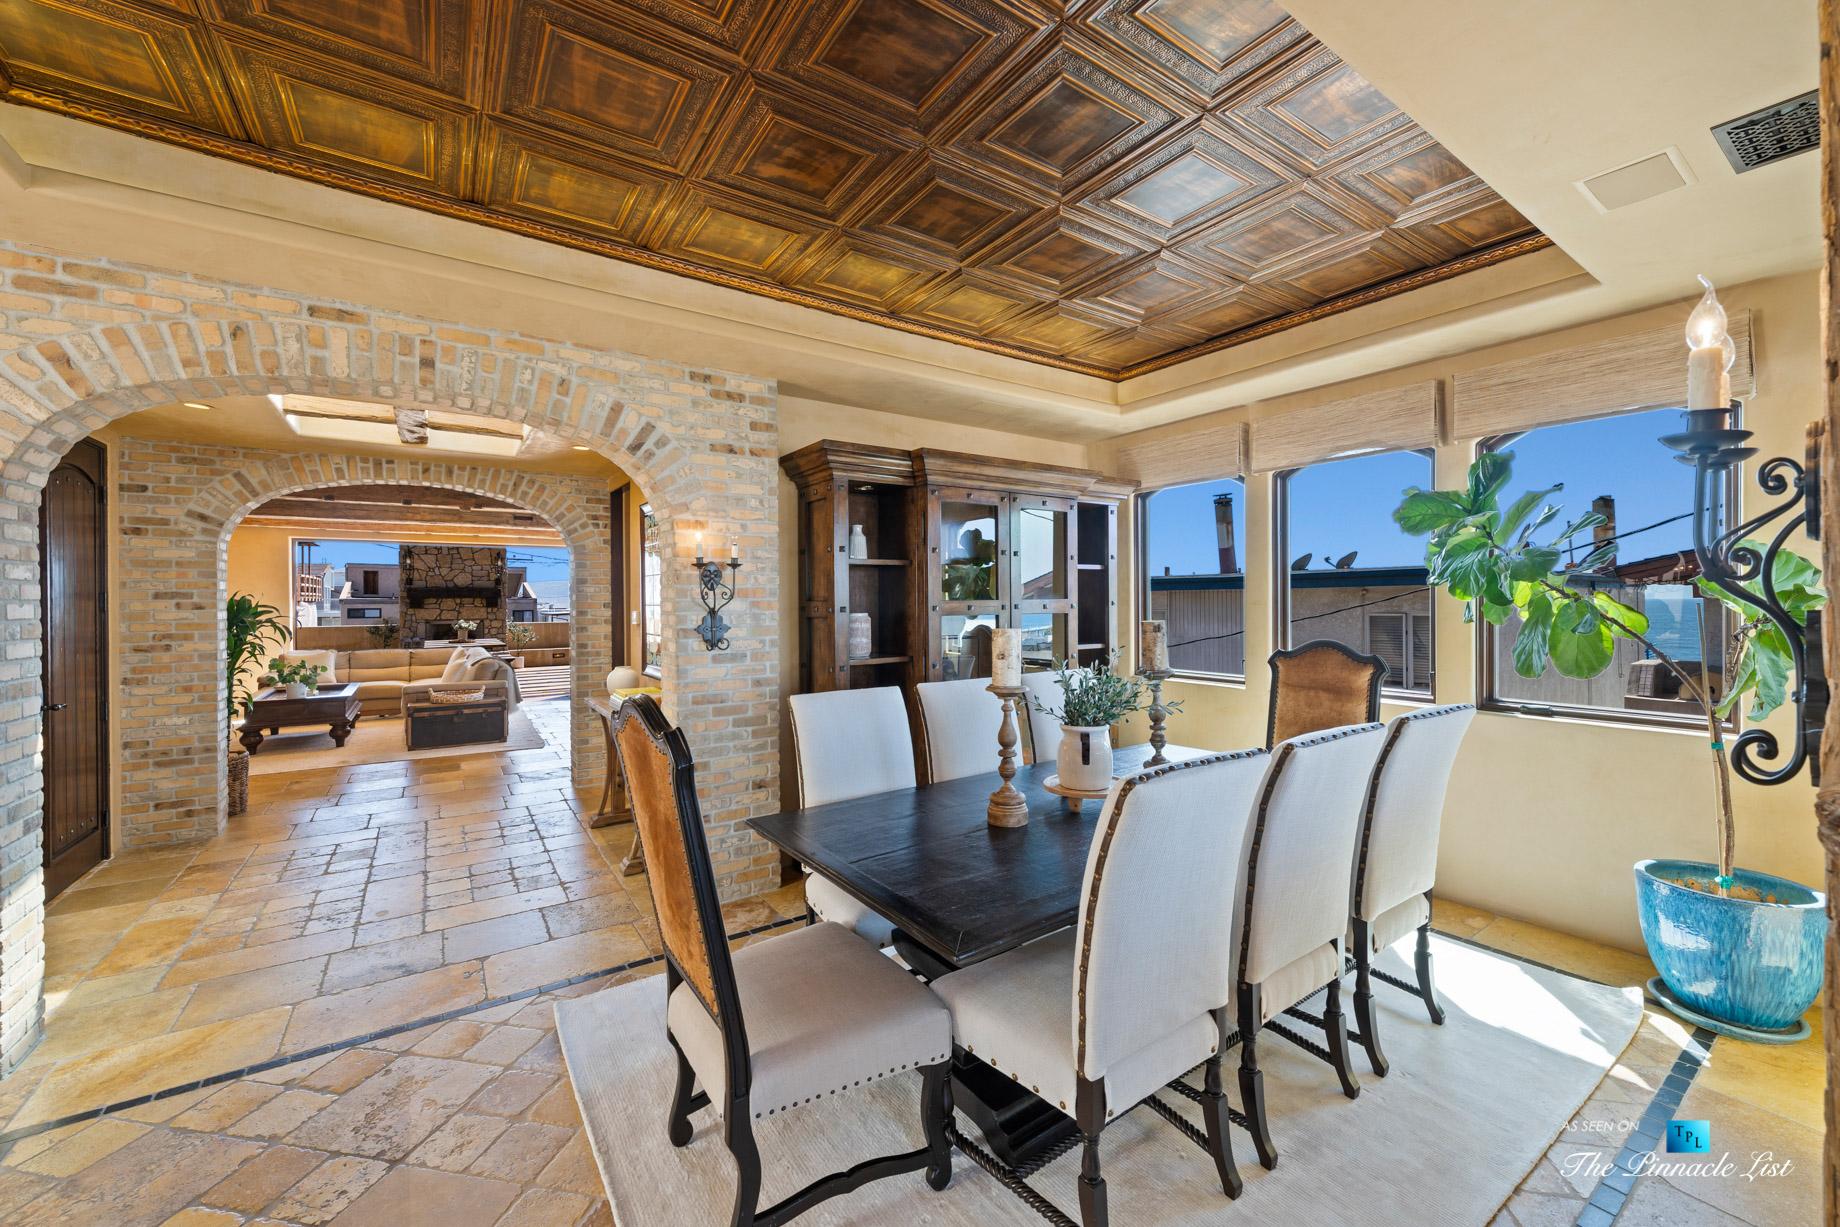 216 7th St, Manhattan Beach, CA, USA - Luxury Real Estate - Coastal Villa Home - Dining Room